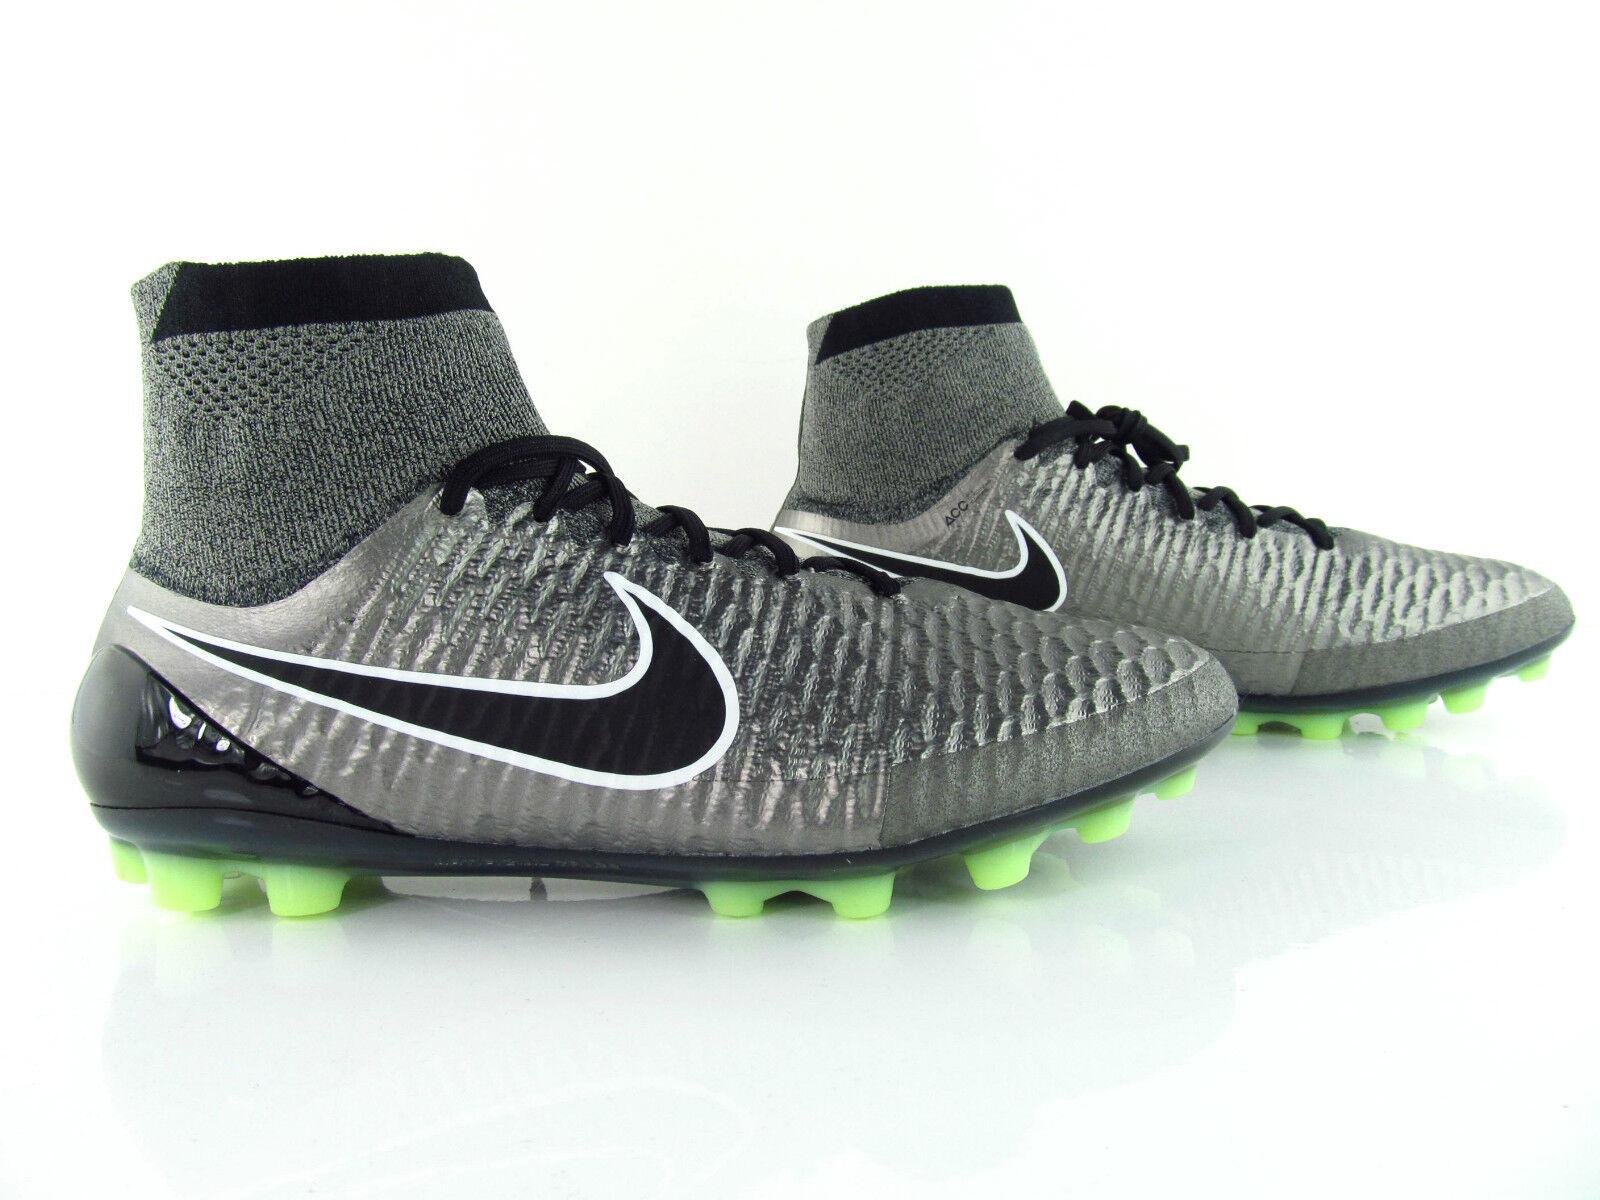 Nike Magista Obra AG-R Silber Sock Cleats Football US_13 Eur_47.5